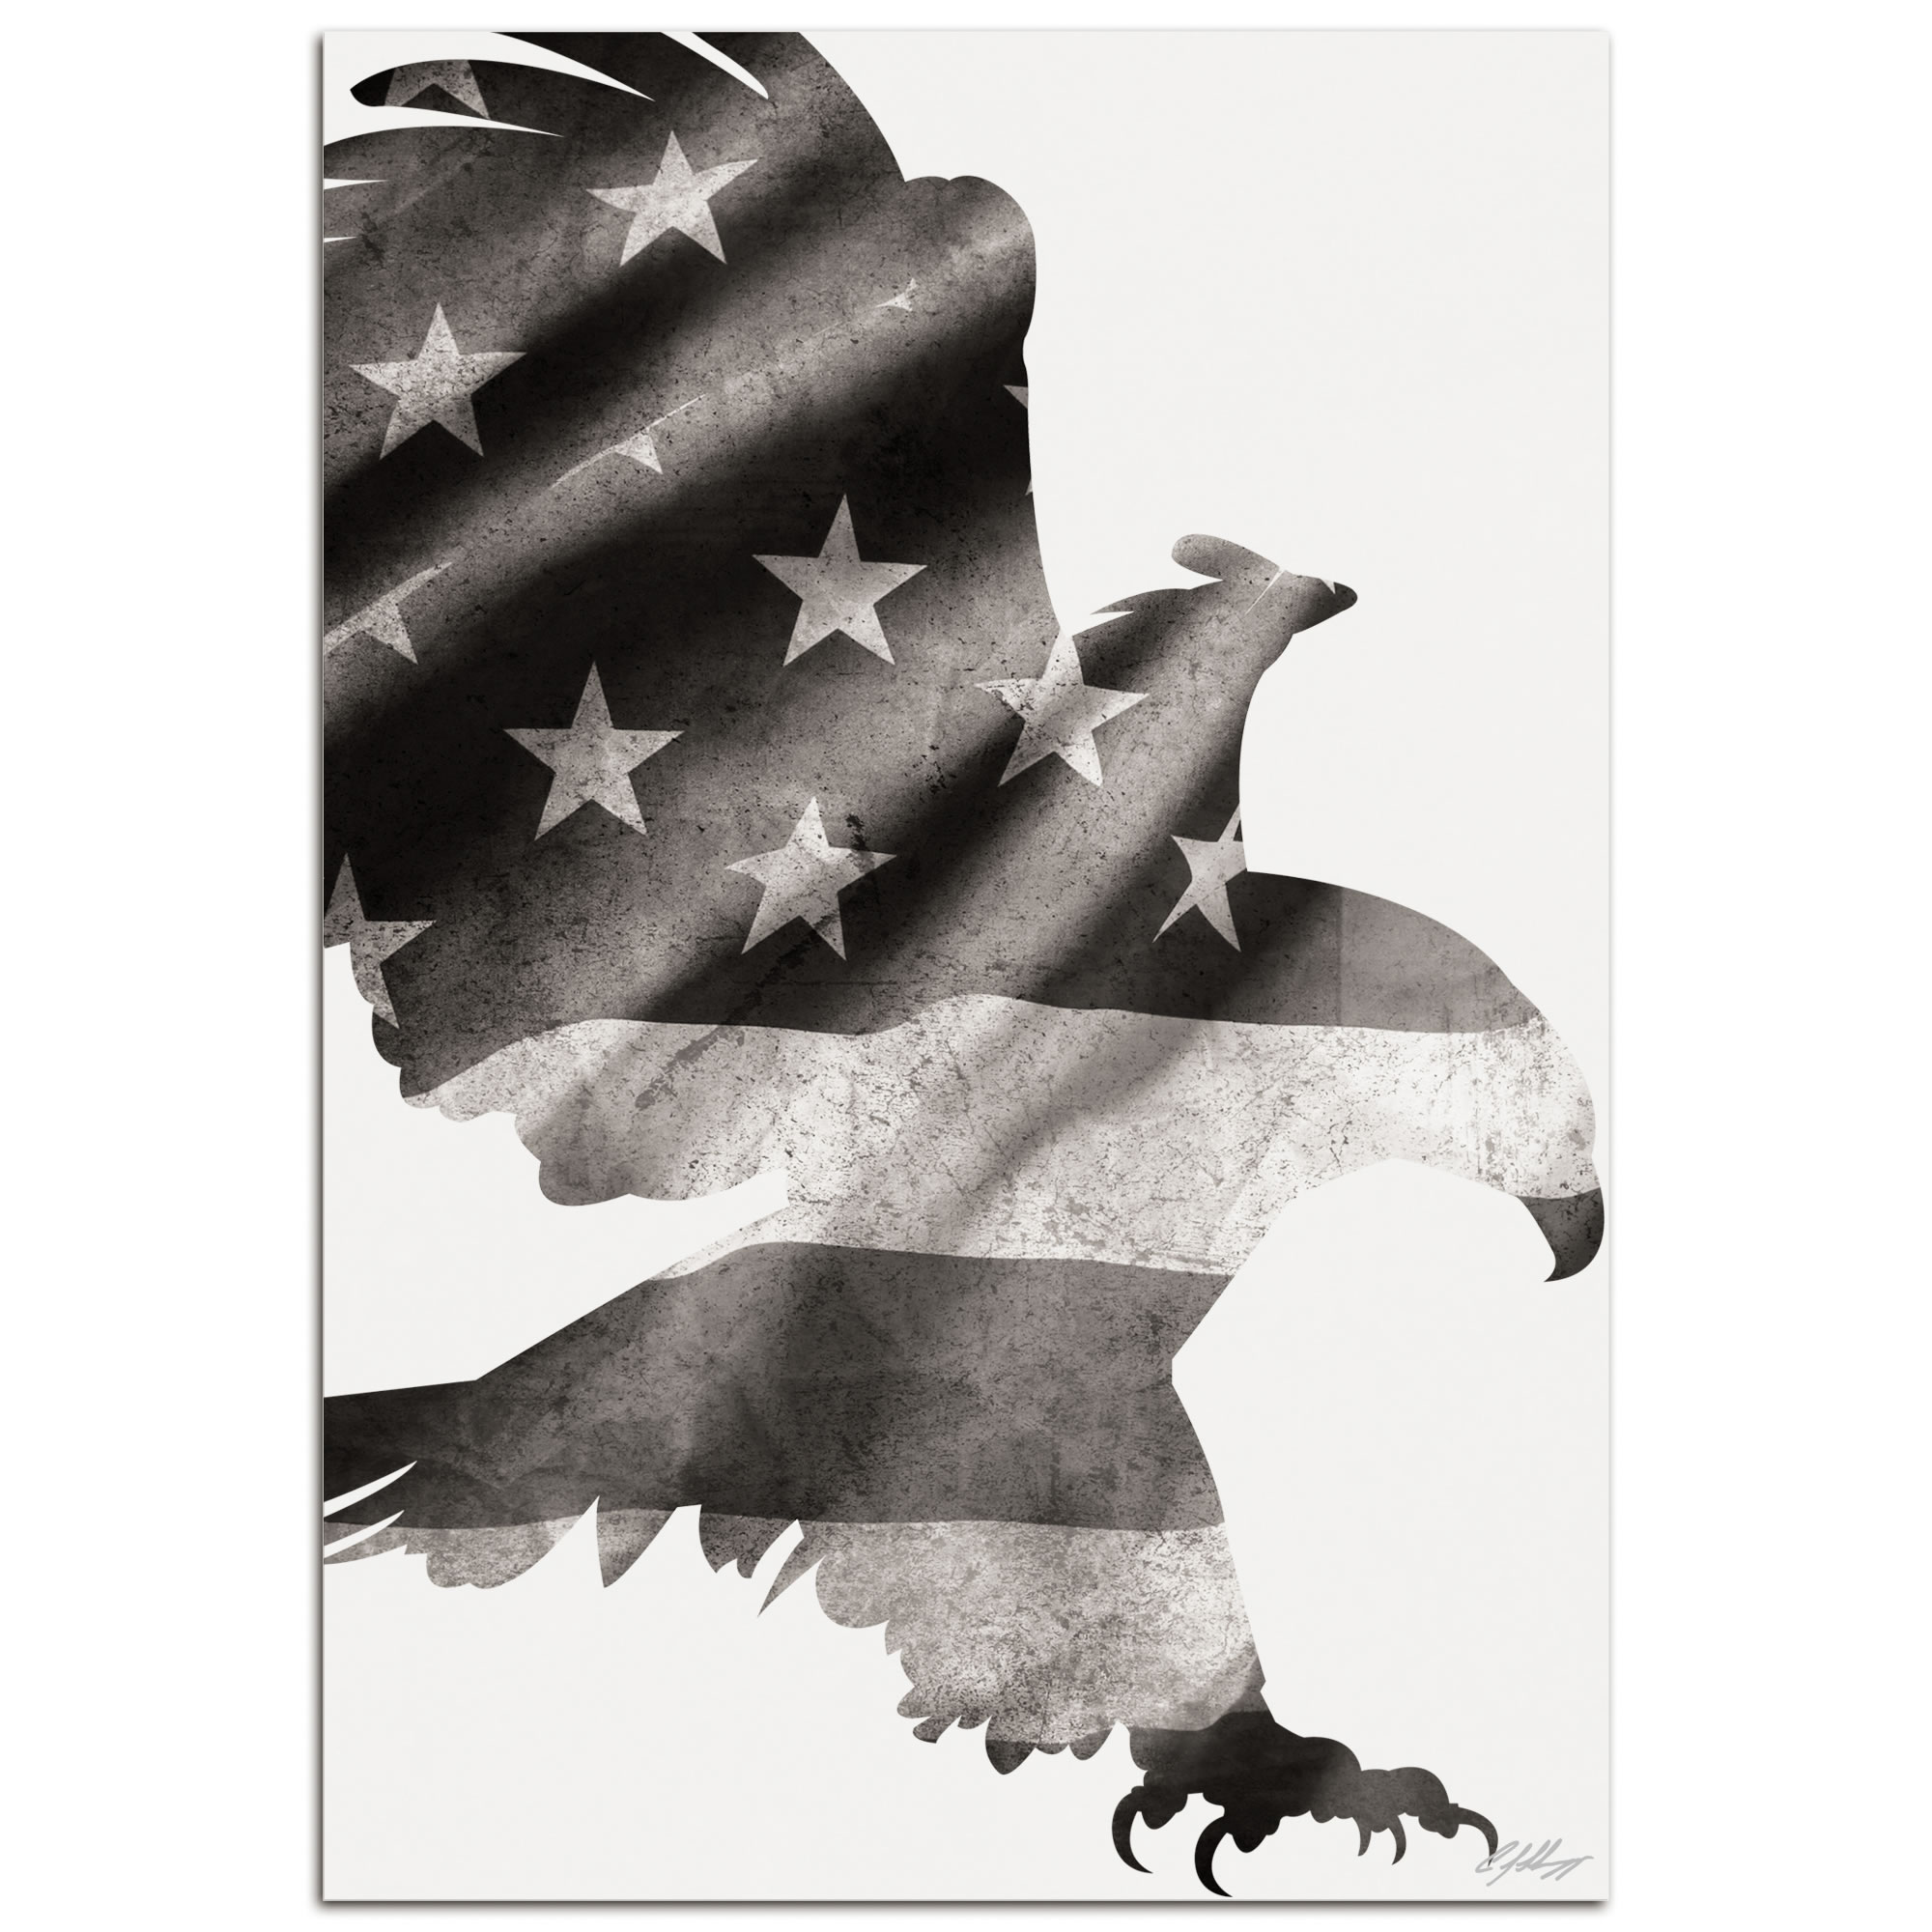 PATRIOT EAGLE BLACK & WHITE - 32x22 in. Metal US Flag Print